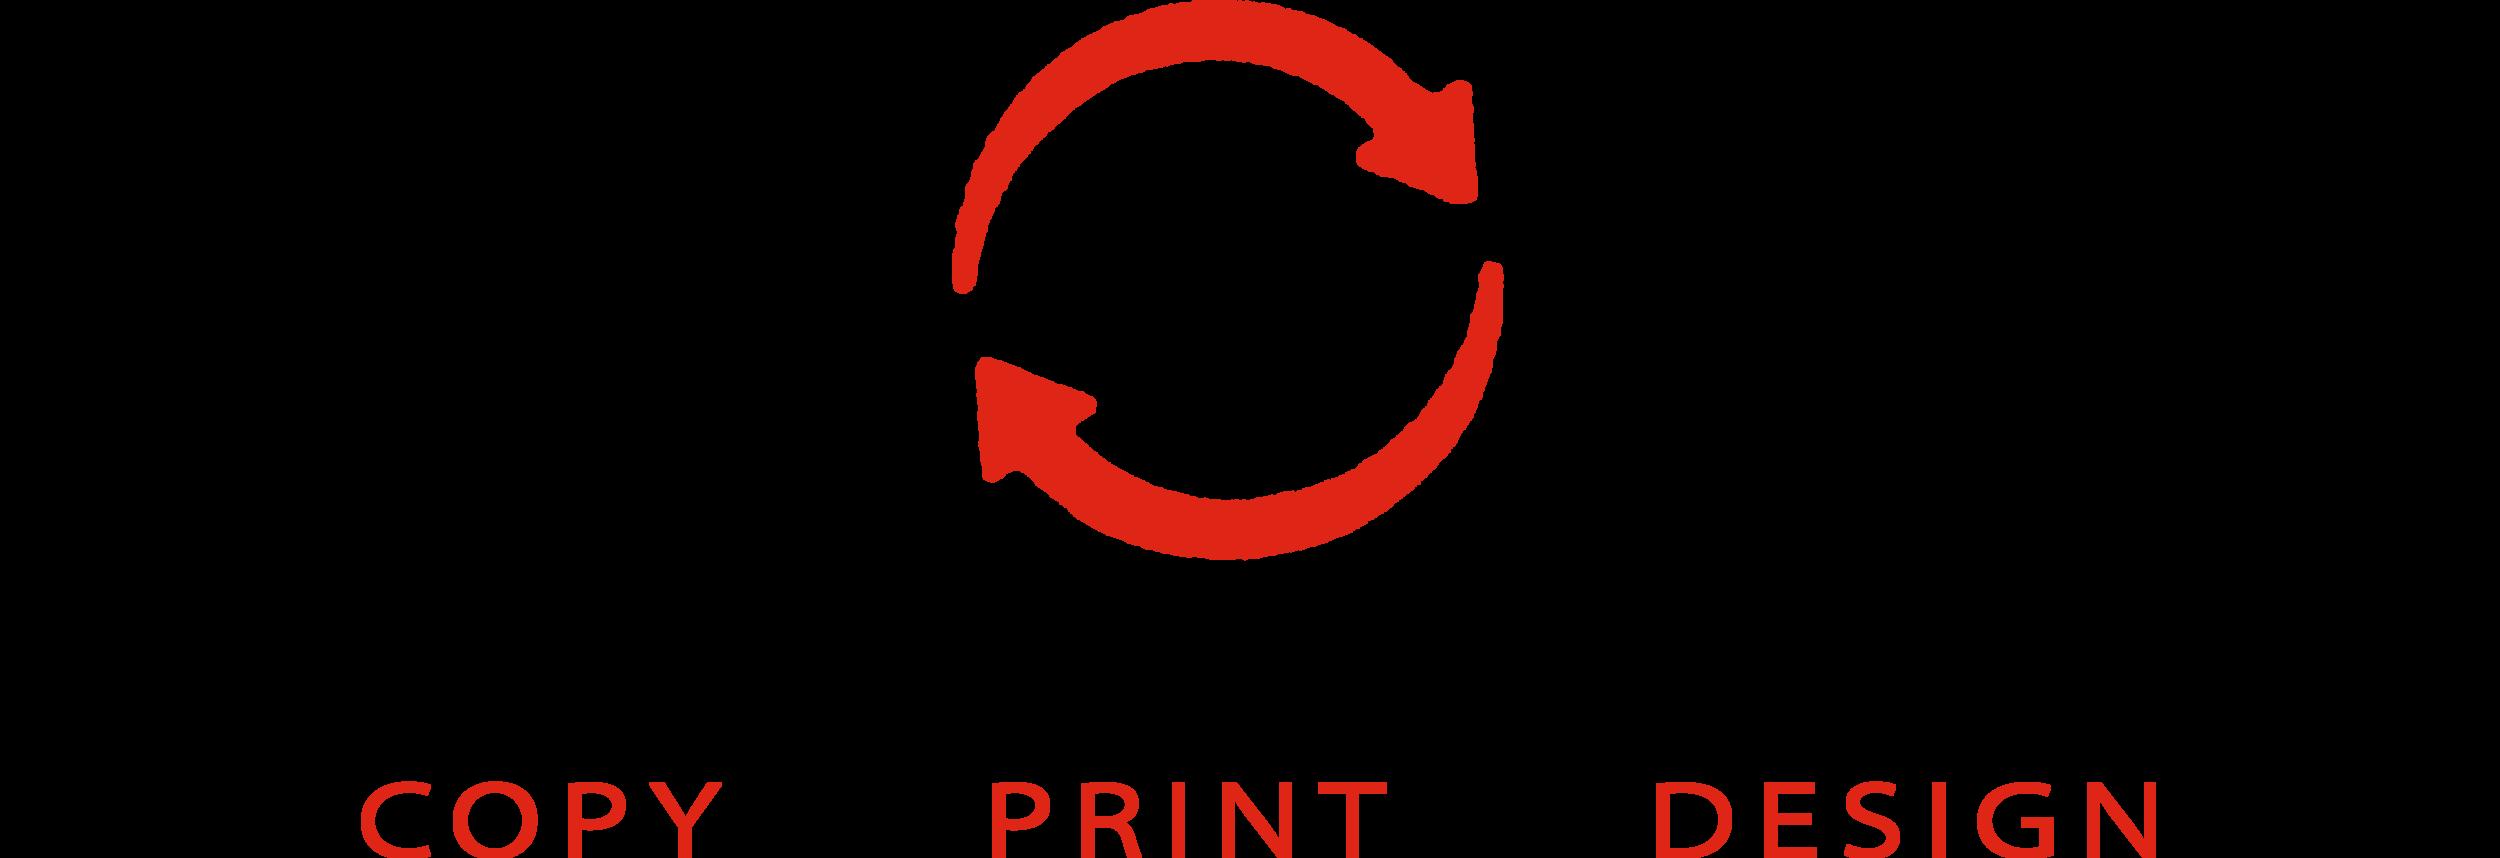 Copy Right Logo_no shadow.png